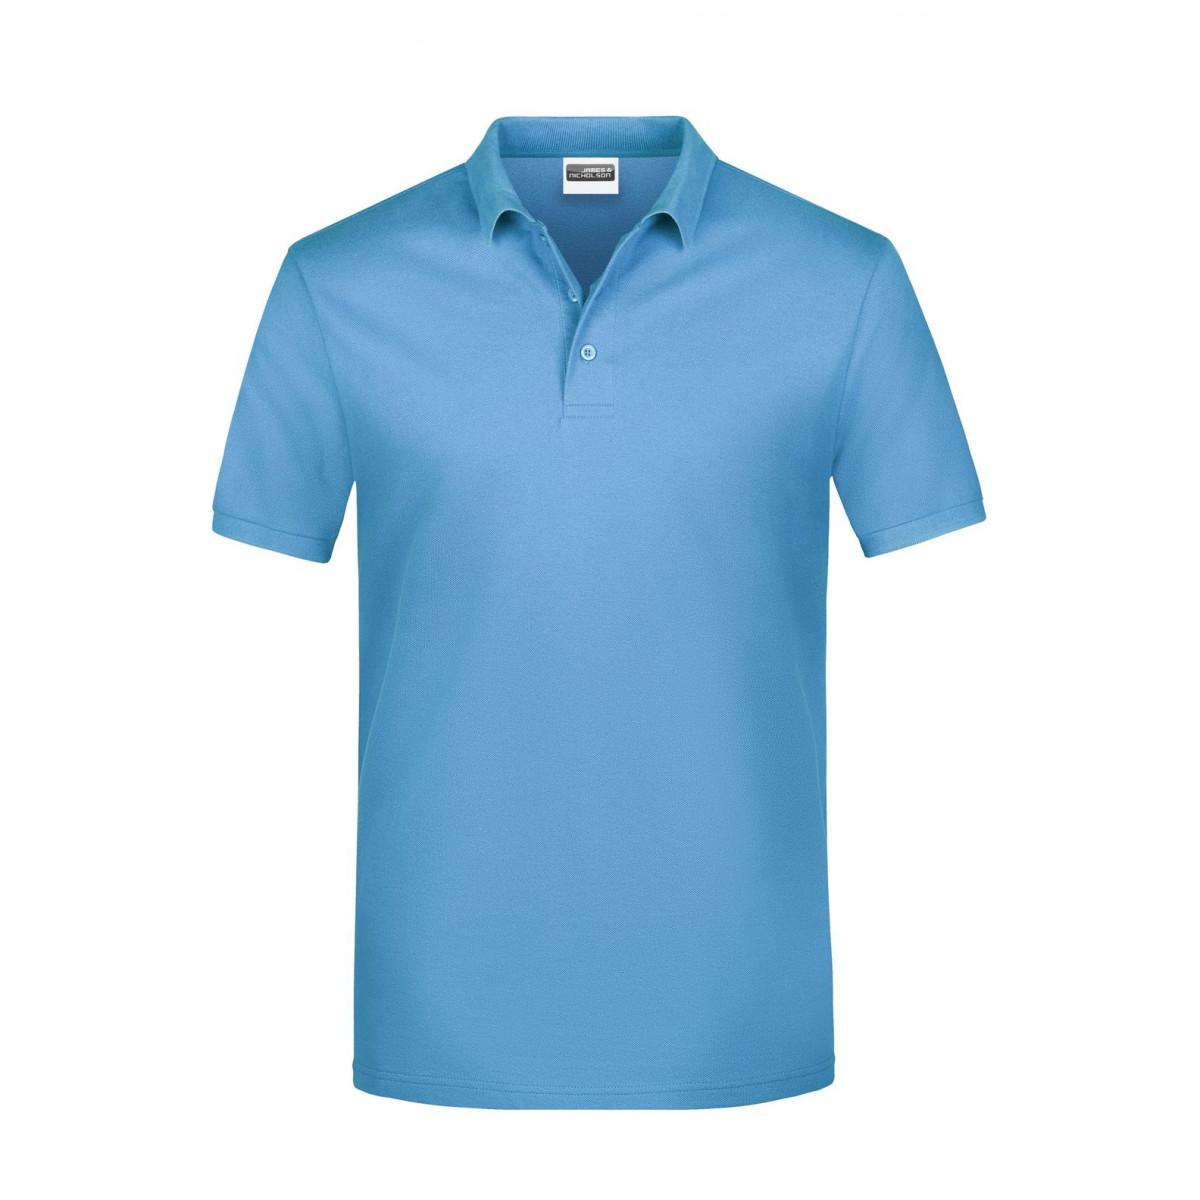 Рубашка поло мужская JN792 Basic Polo Man - Небесно-голубой